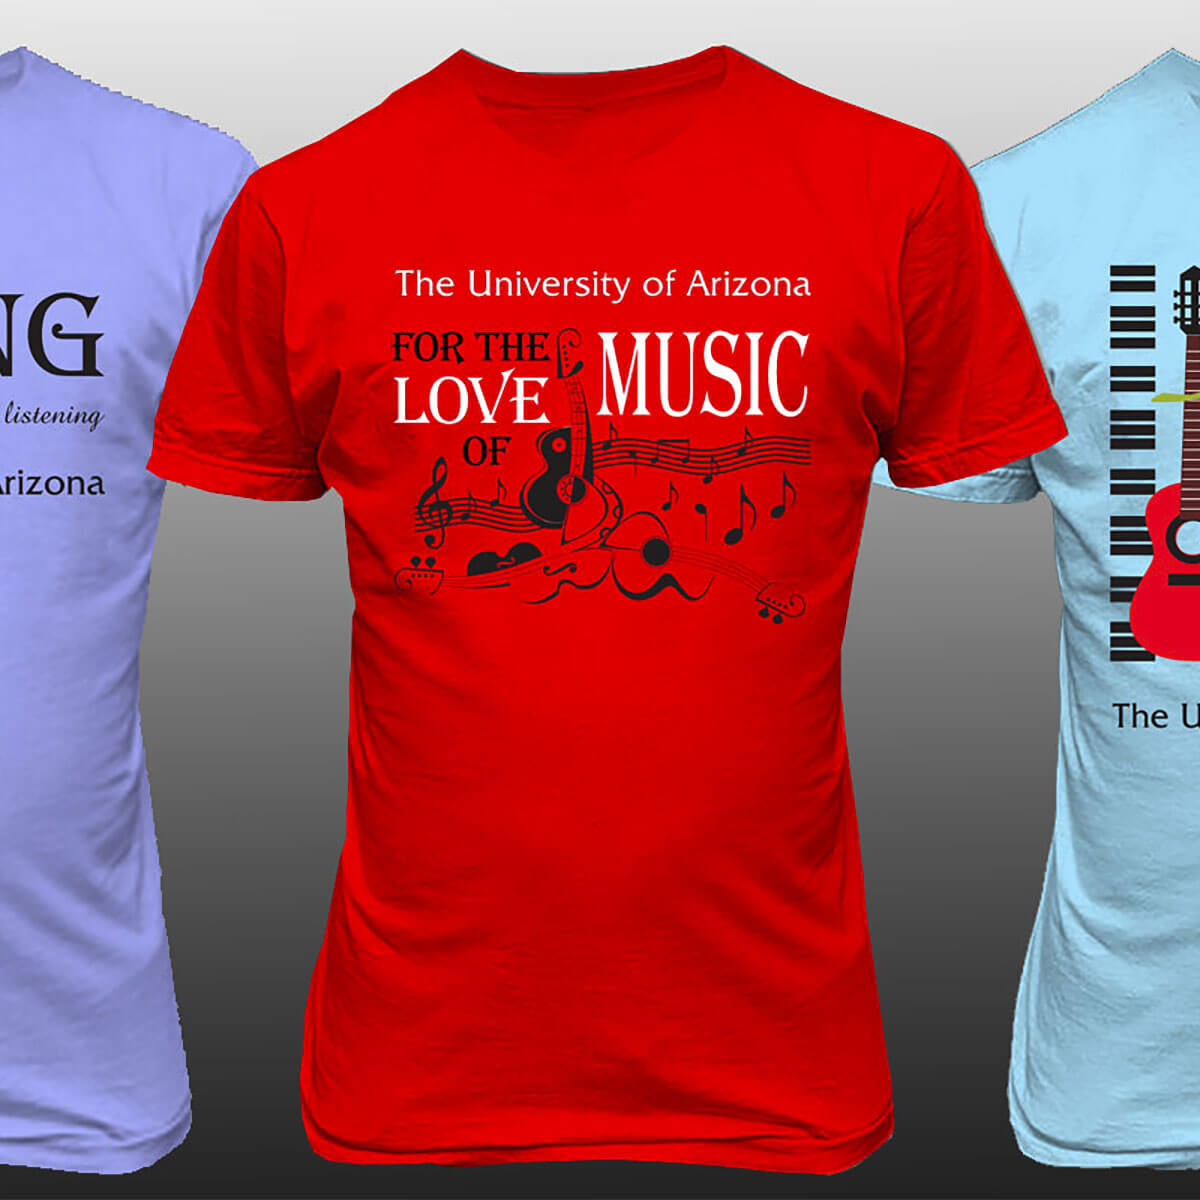 T-Shirts for University of Arizona Music Department